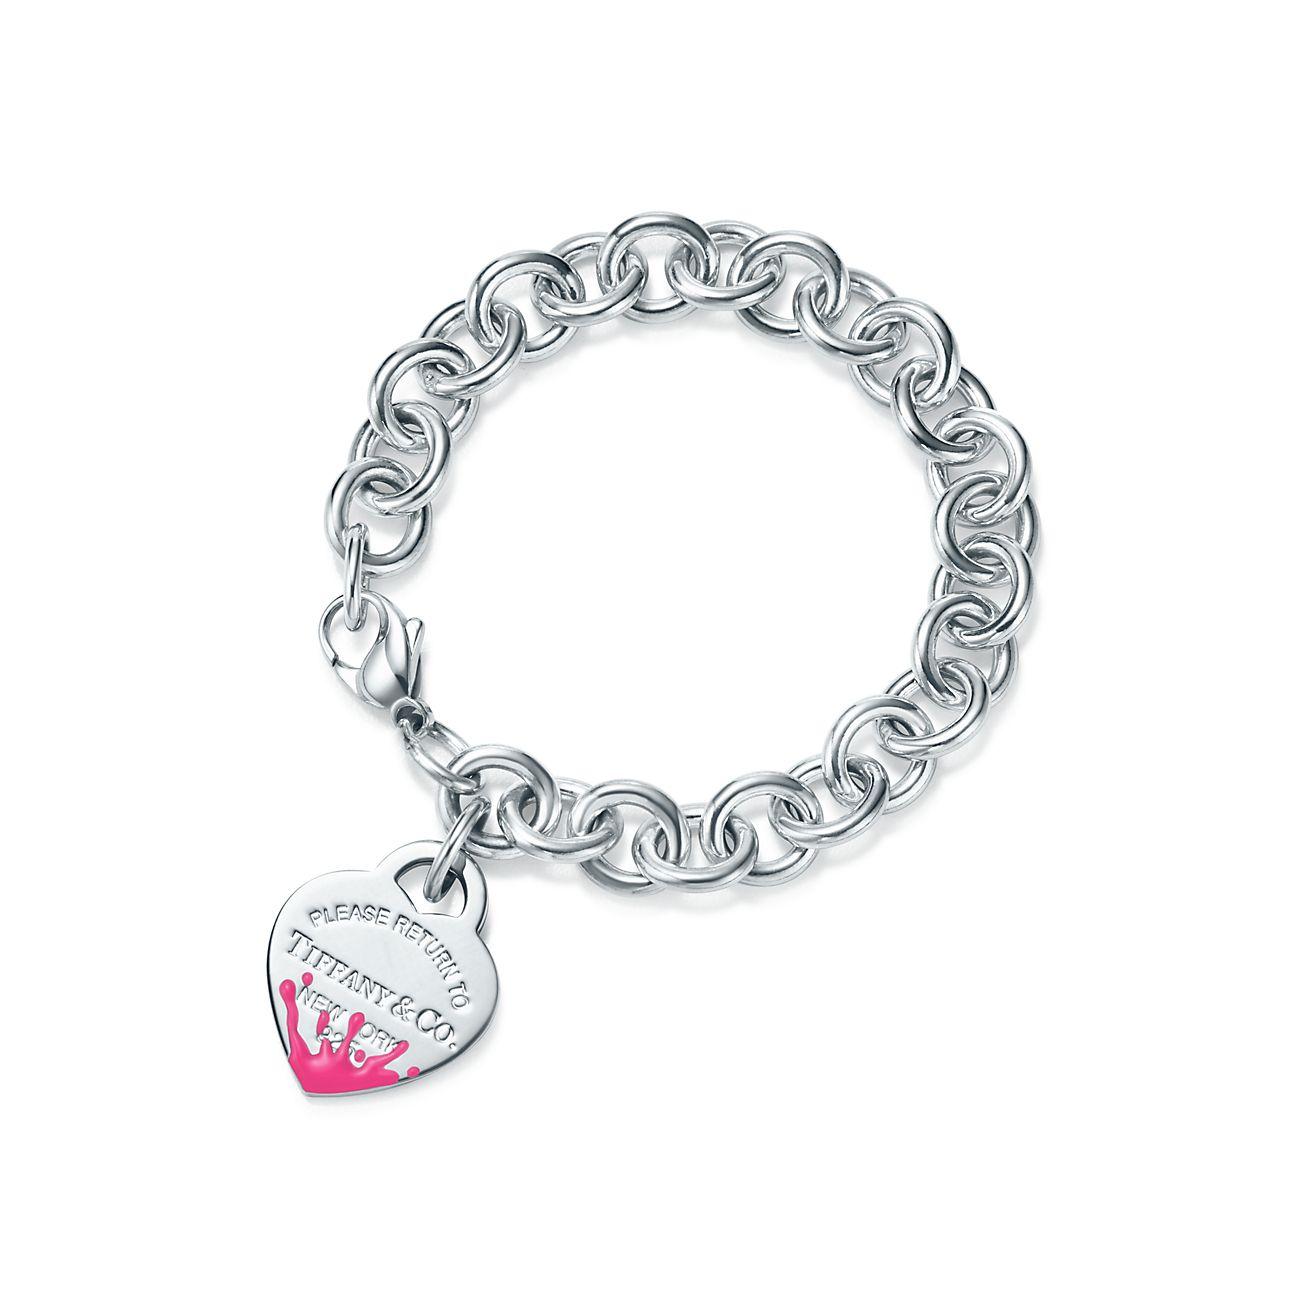 Tiffany Necklaces Co Australia Outlet Elsa Peretti Full Heart Earrings